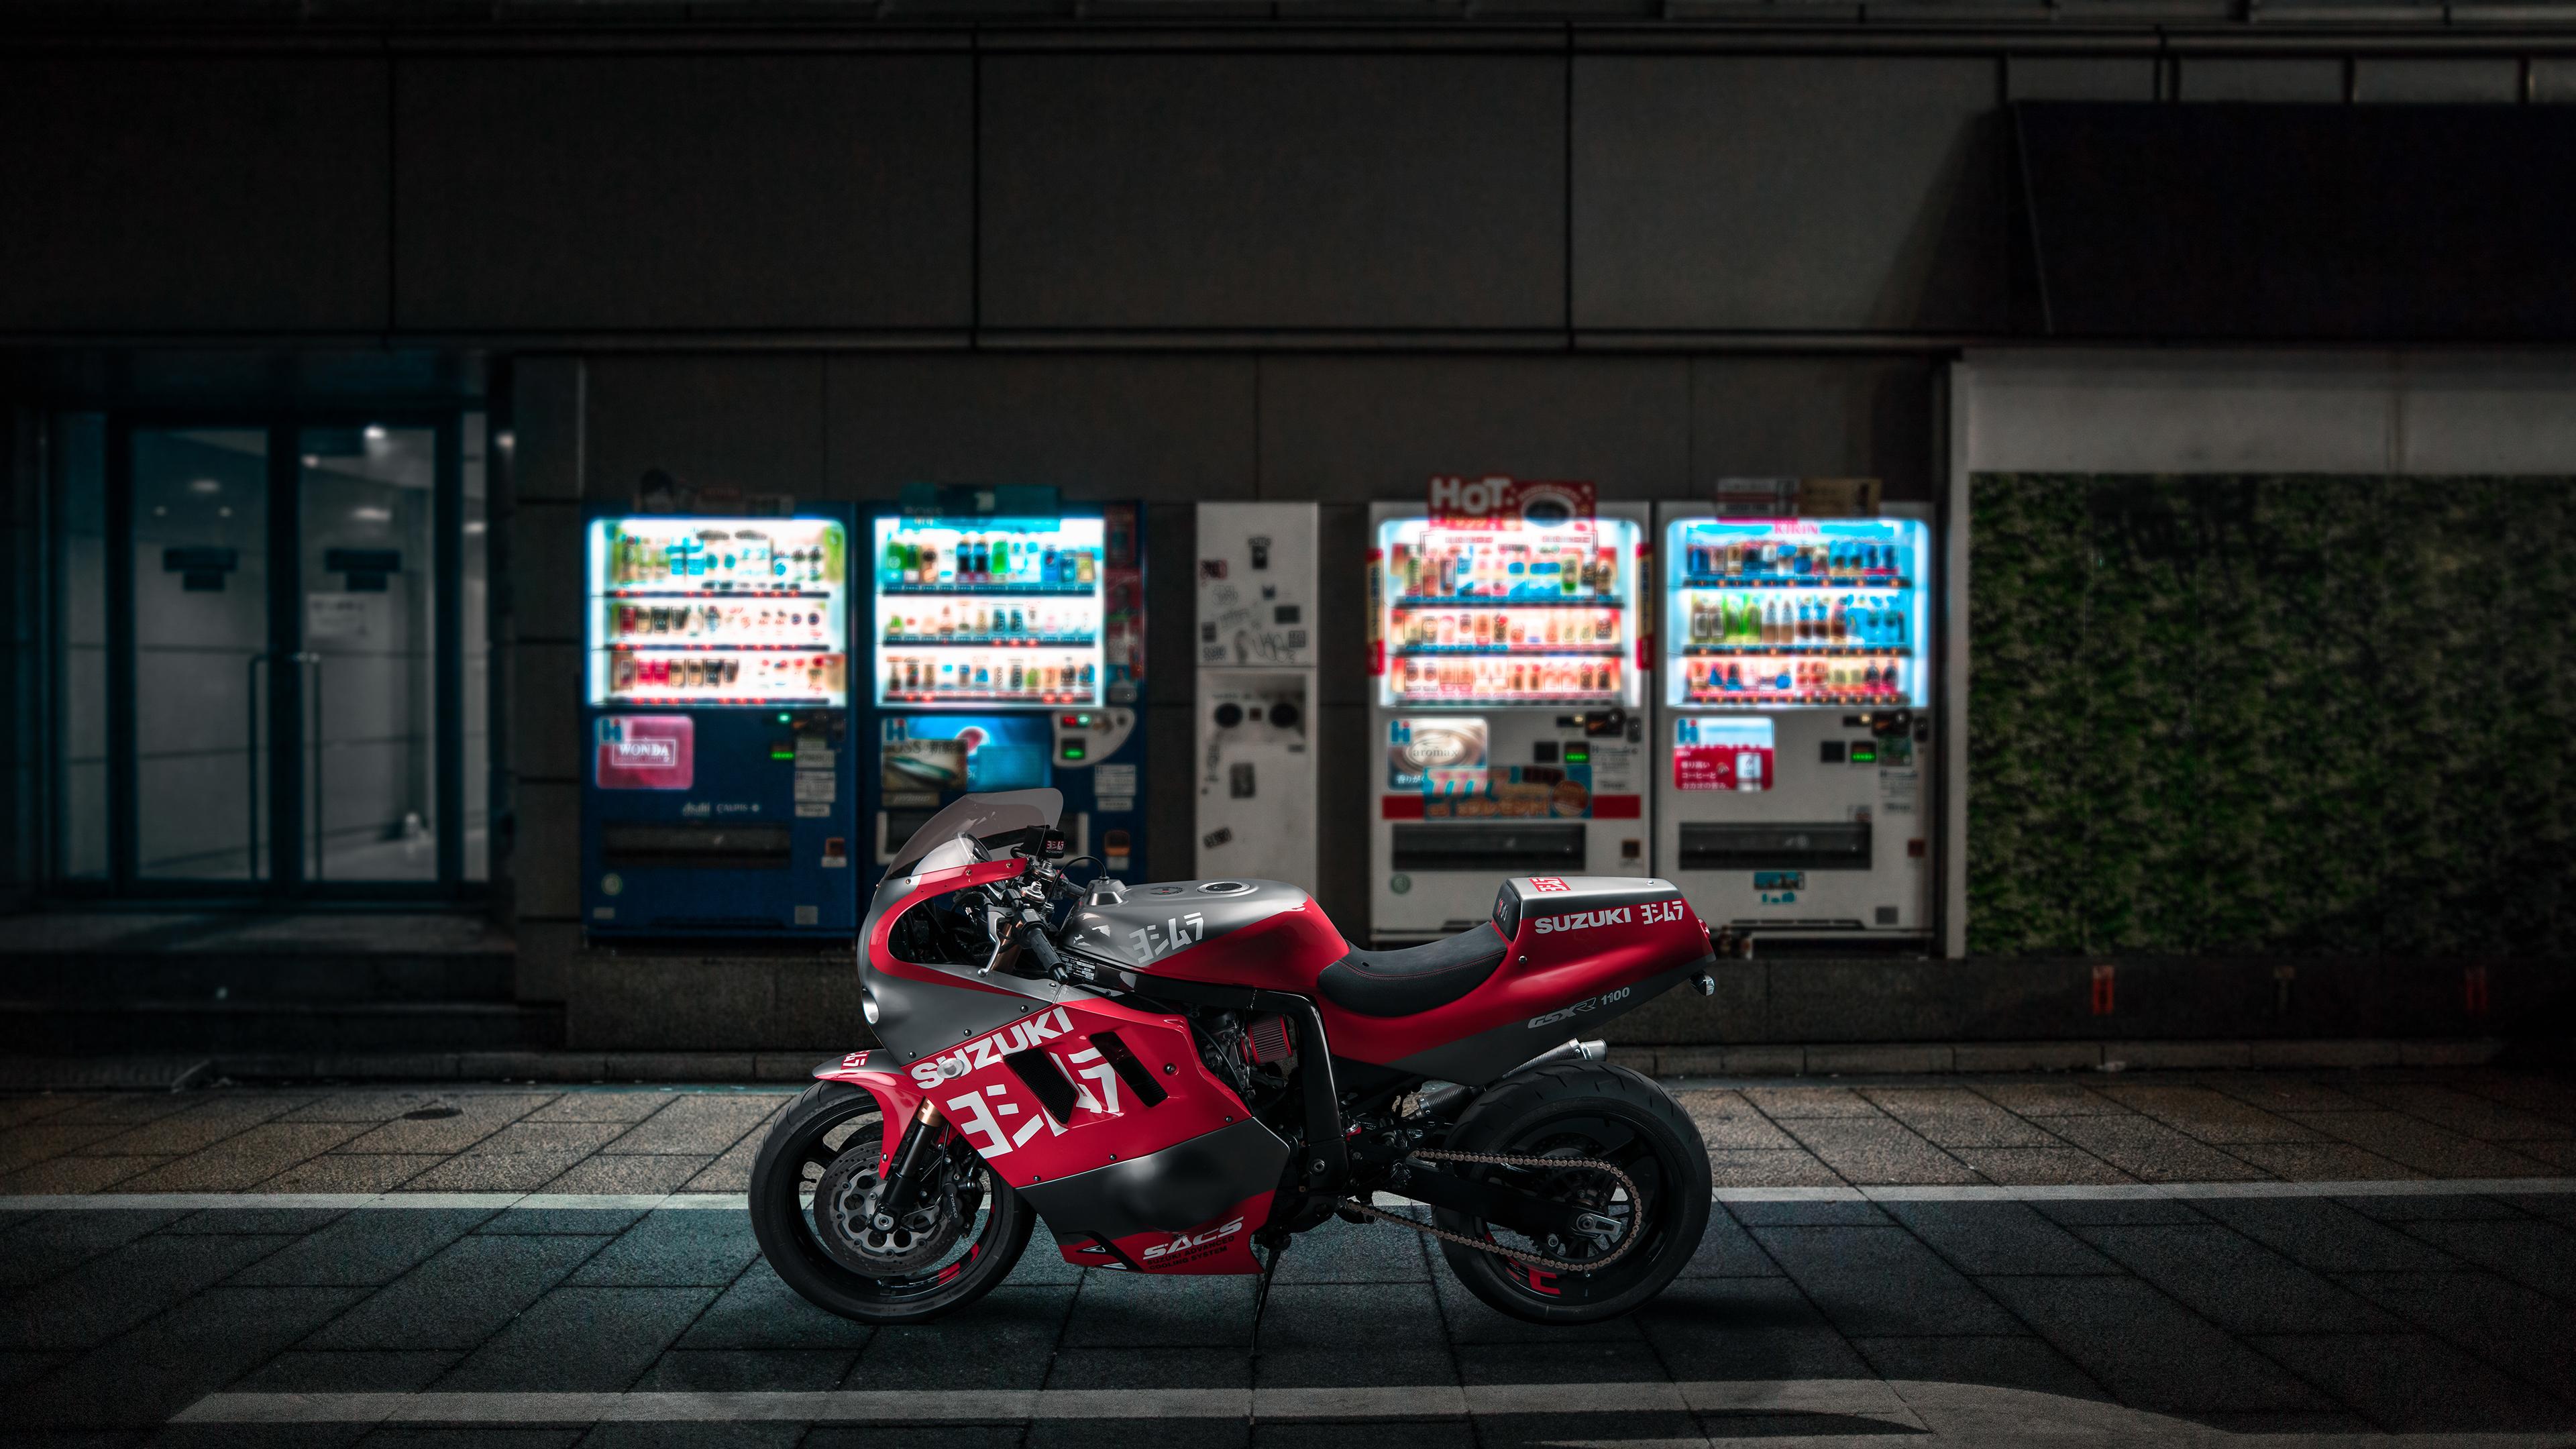 venom suzuki gsxr 1100 1536316569 - Venom Suzuki GSXR 1100 - Venom wallpapers, suzuki wallpapers, hd-wallpapers, bikes wallpapers, behance wallpapers, artist wallpapers, 4k-wallpapers